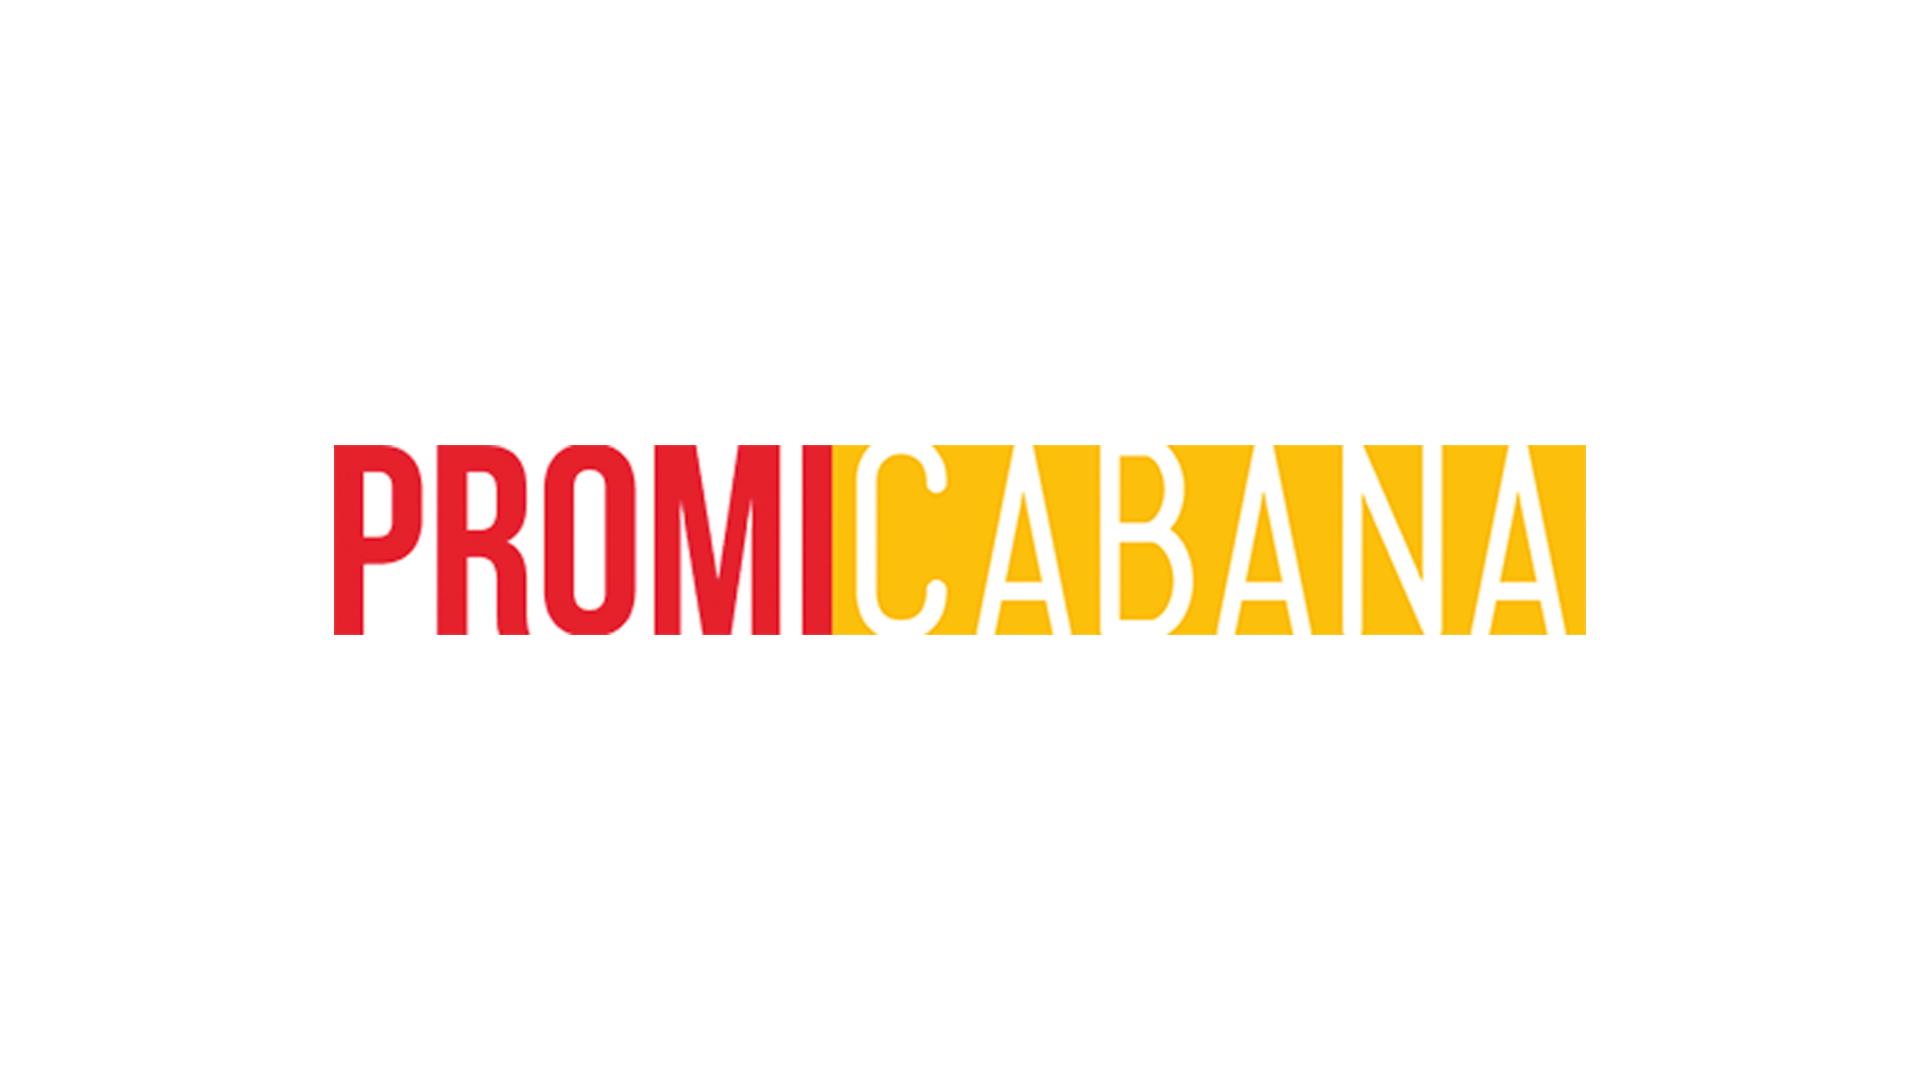 Lorde-Yellow-Flicker-Beat-Musikvideo-Hunger-Games-Mockingjay